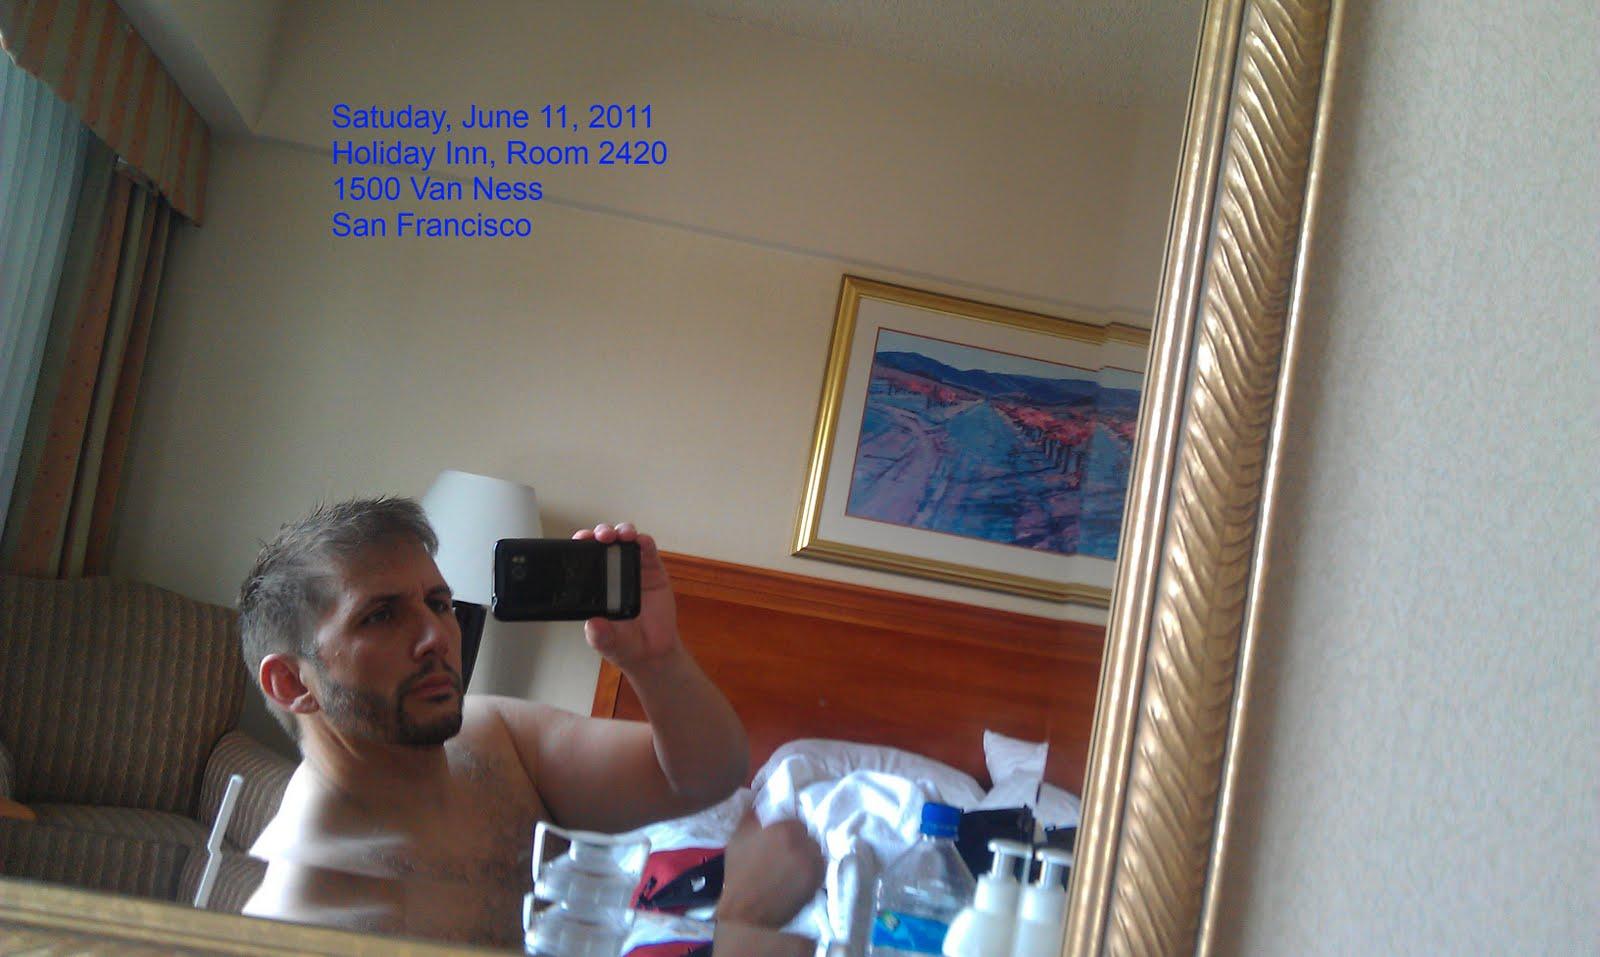 http://3.bp.blogspot.com/-JXNAi9Esy4Q/Tfgf795ZiaI/AAAAAAAABMk/BEJH_Wc9T_c/s1600/Dave.jpg